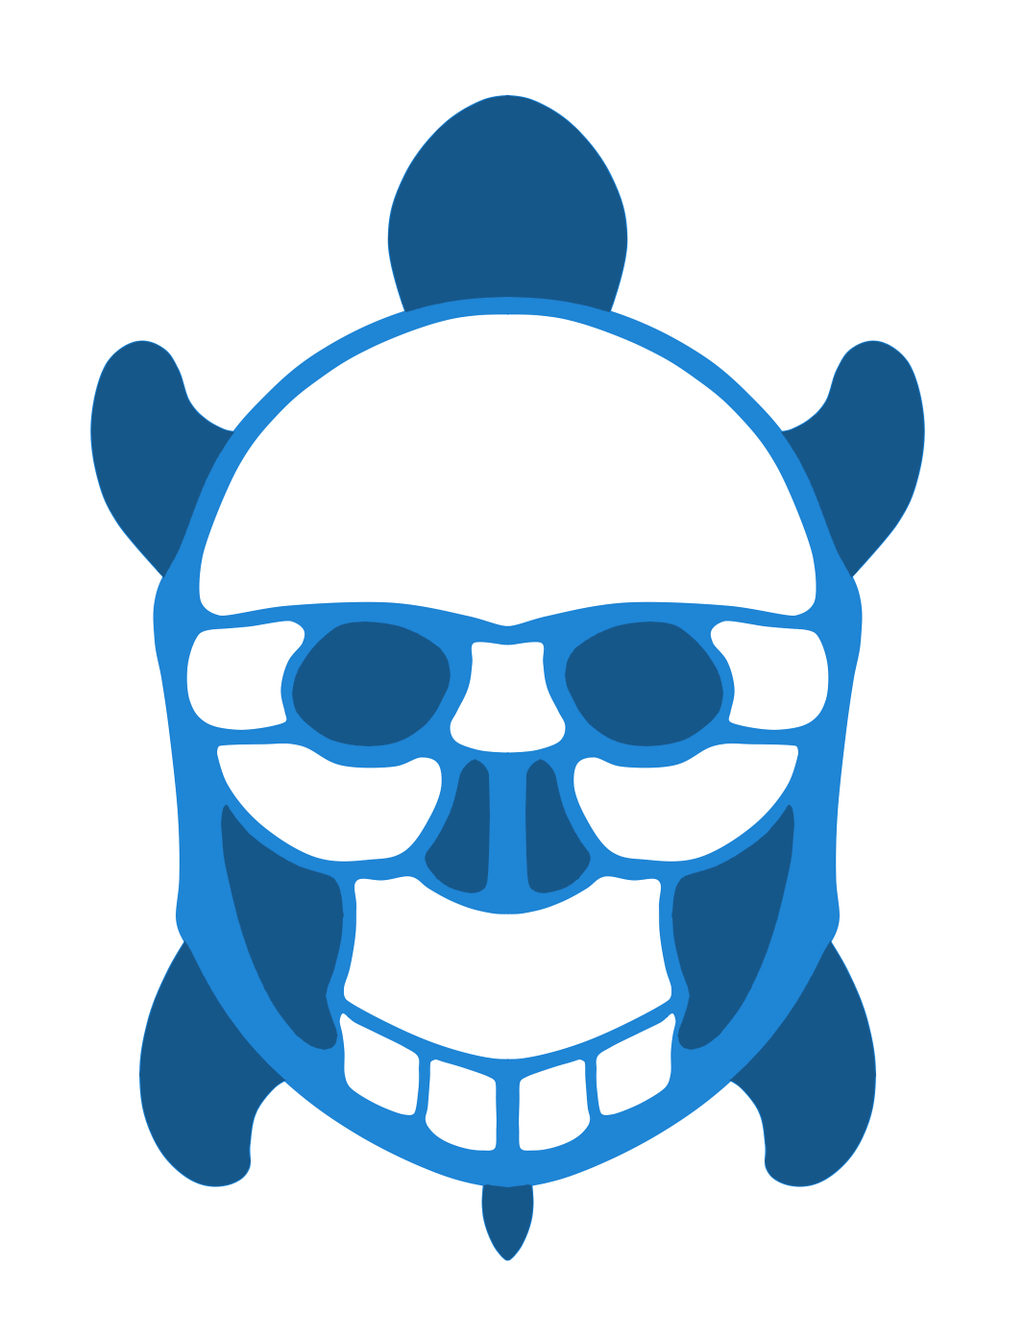 Jugger Emblem - Rigor Tortoise